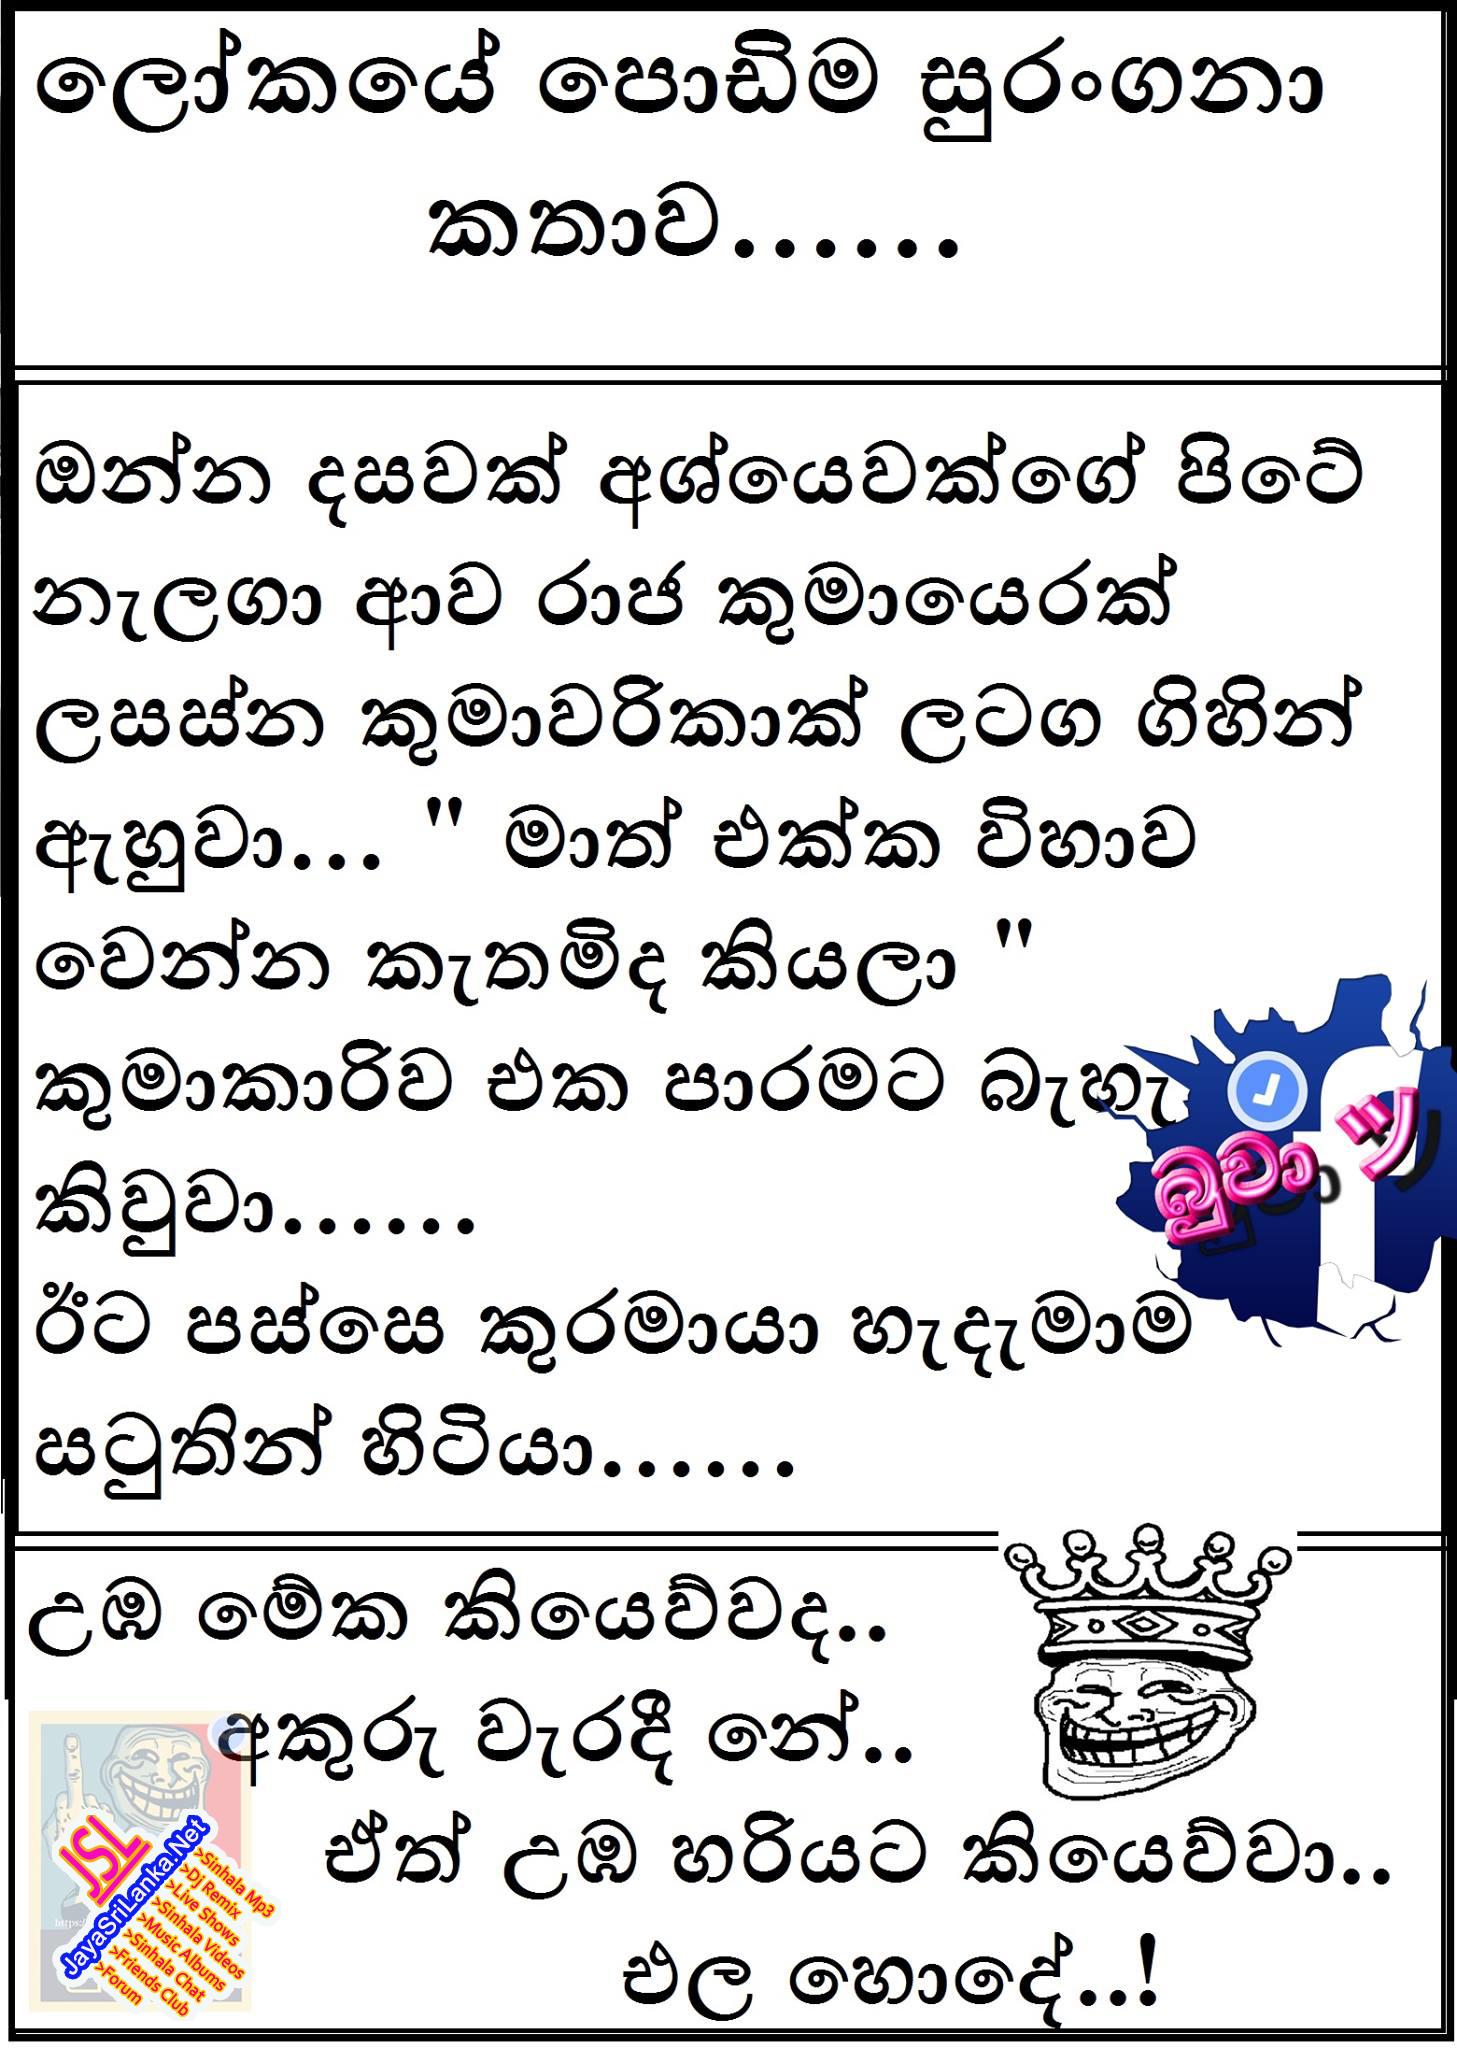 Sinhala Actress Facebook Kello   Foto Bugil Bokep 2017